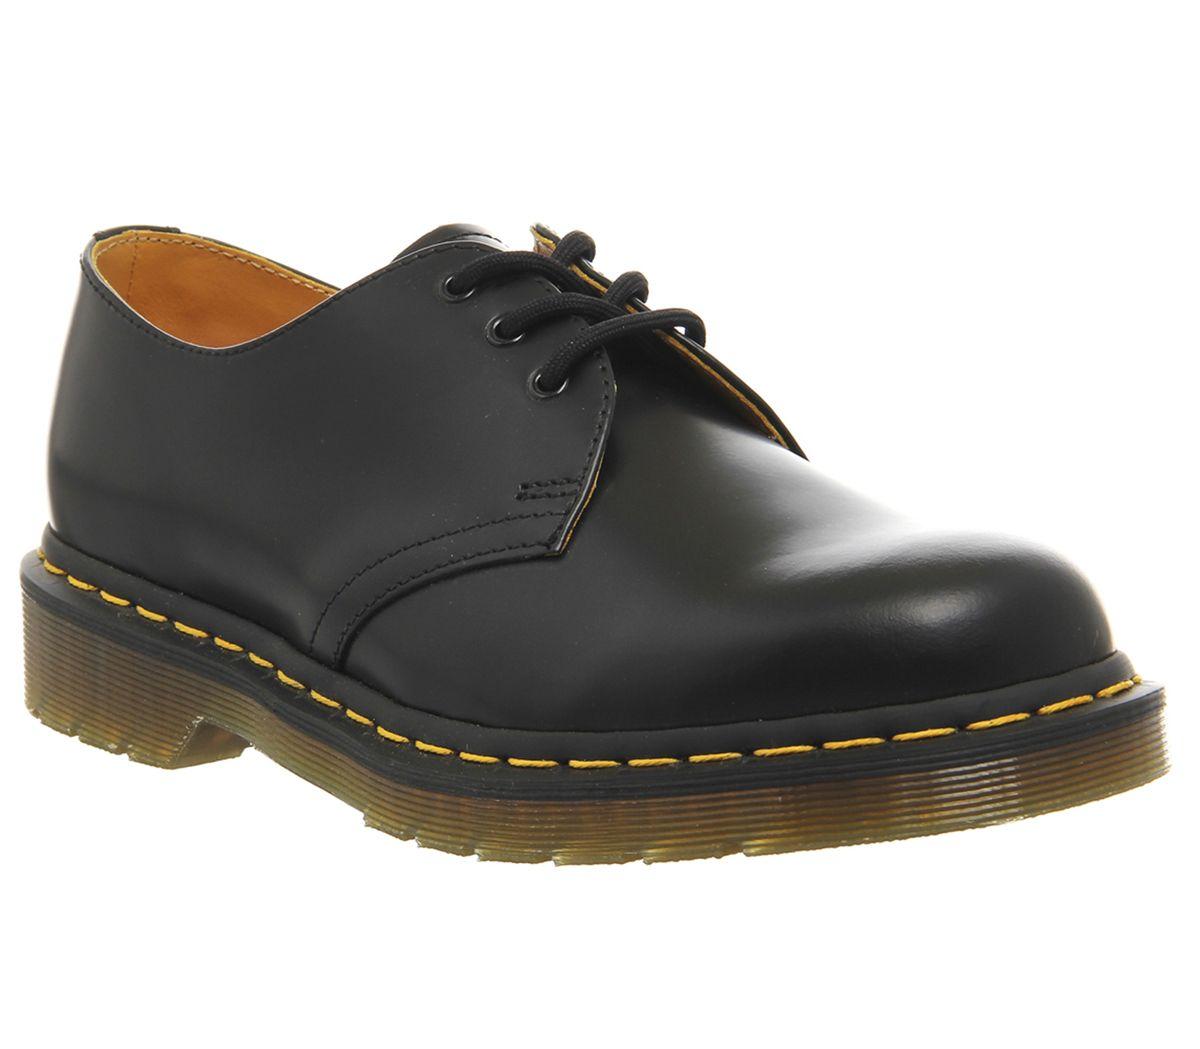 f988093c9f Dr. Martens 3 Eye Lace Shoes Black Leather - Smart